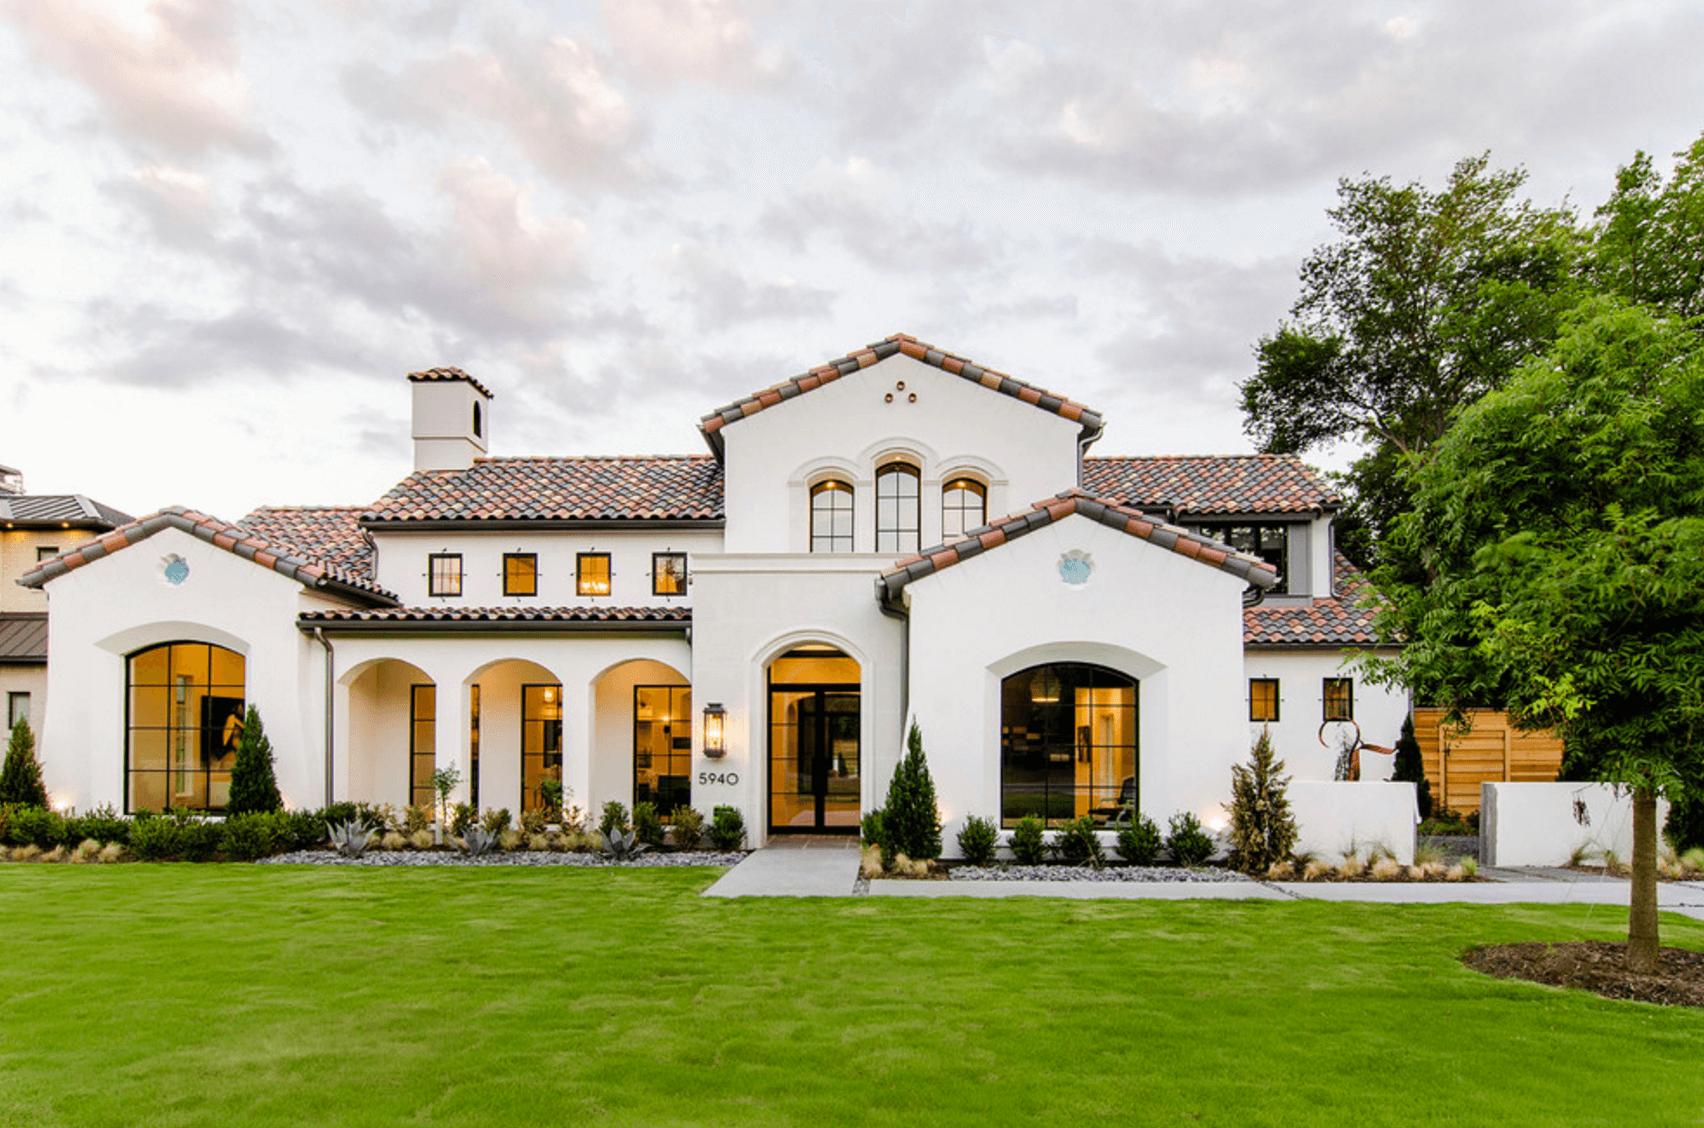 25 White Exterior Ideas for a Bright, Modern Home - http://freshome ...